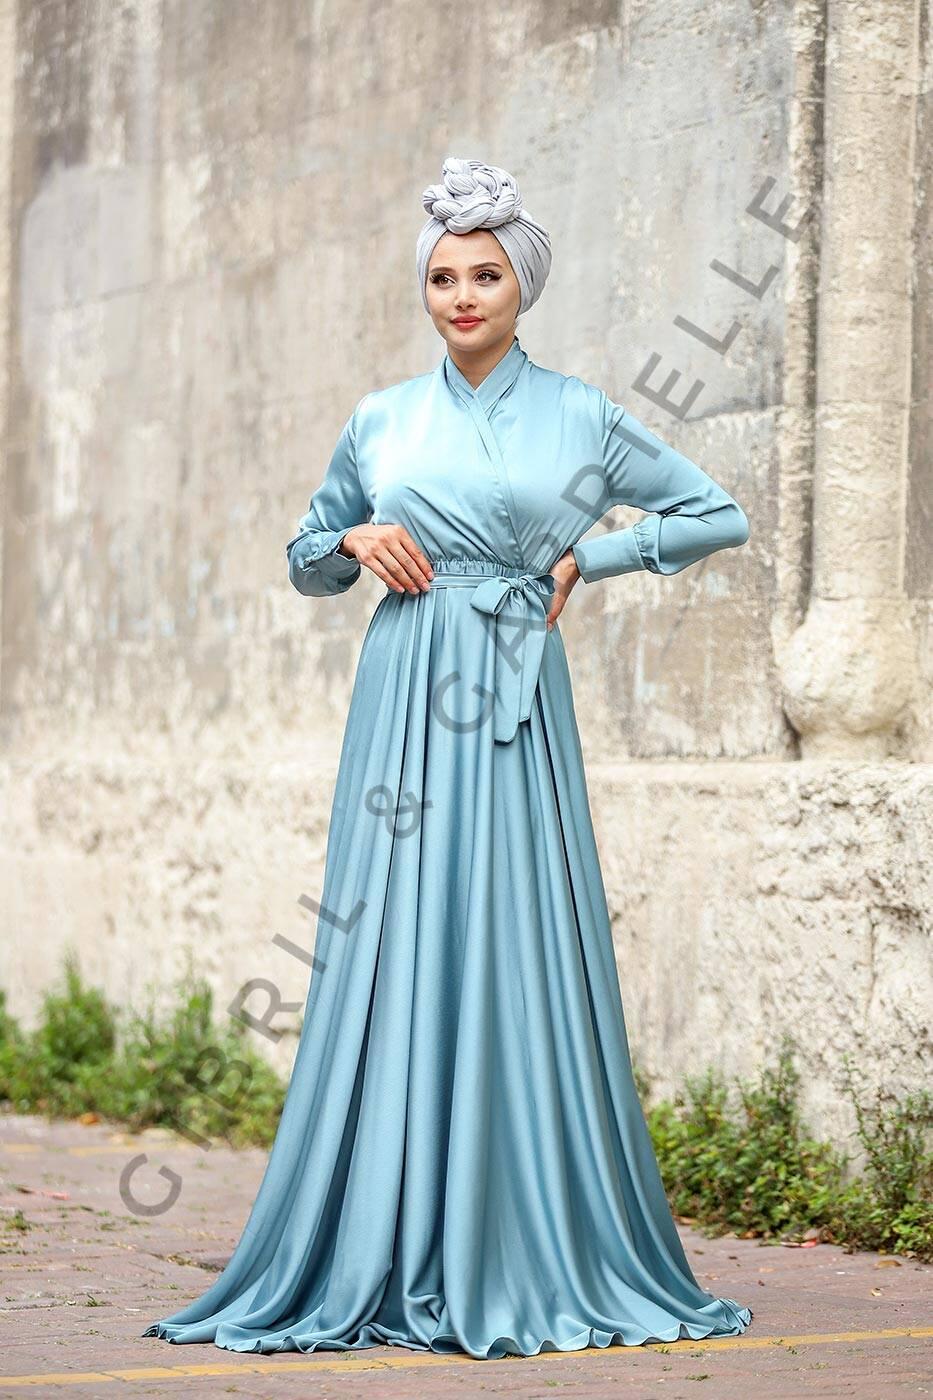 Mennel Dress - Turquoise Blue